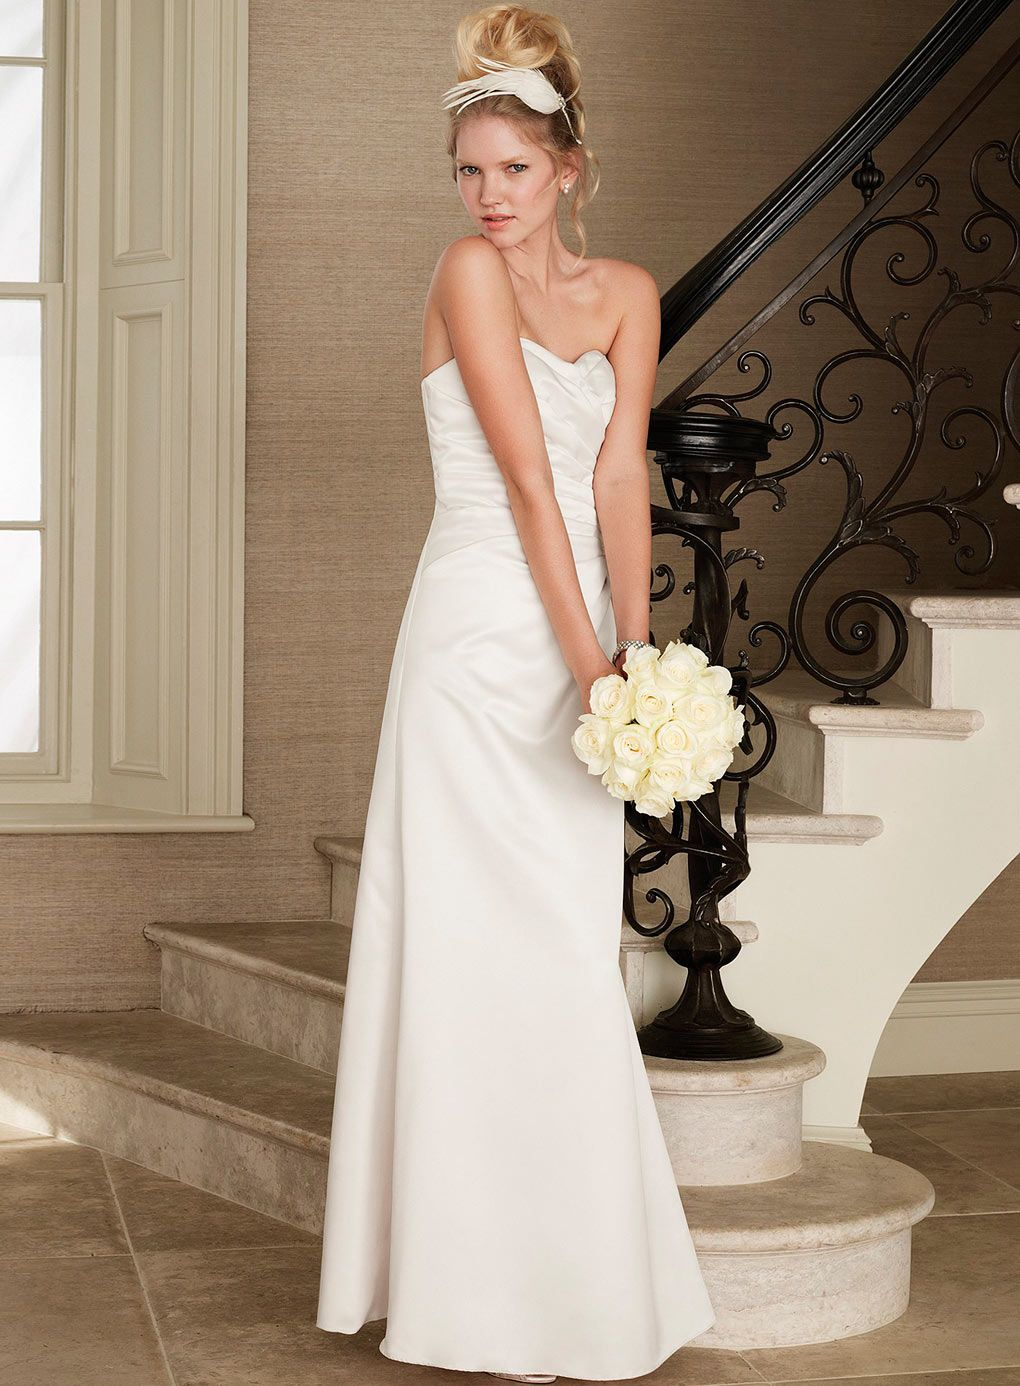 Girls wedding dress  Wedding Dress Violetta Ivory Satin Bridal Dress  Minimal classic